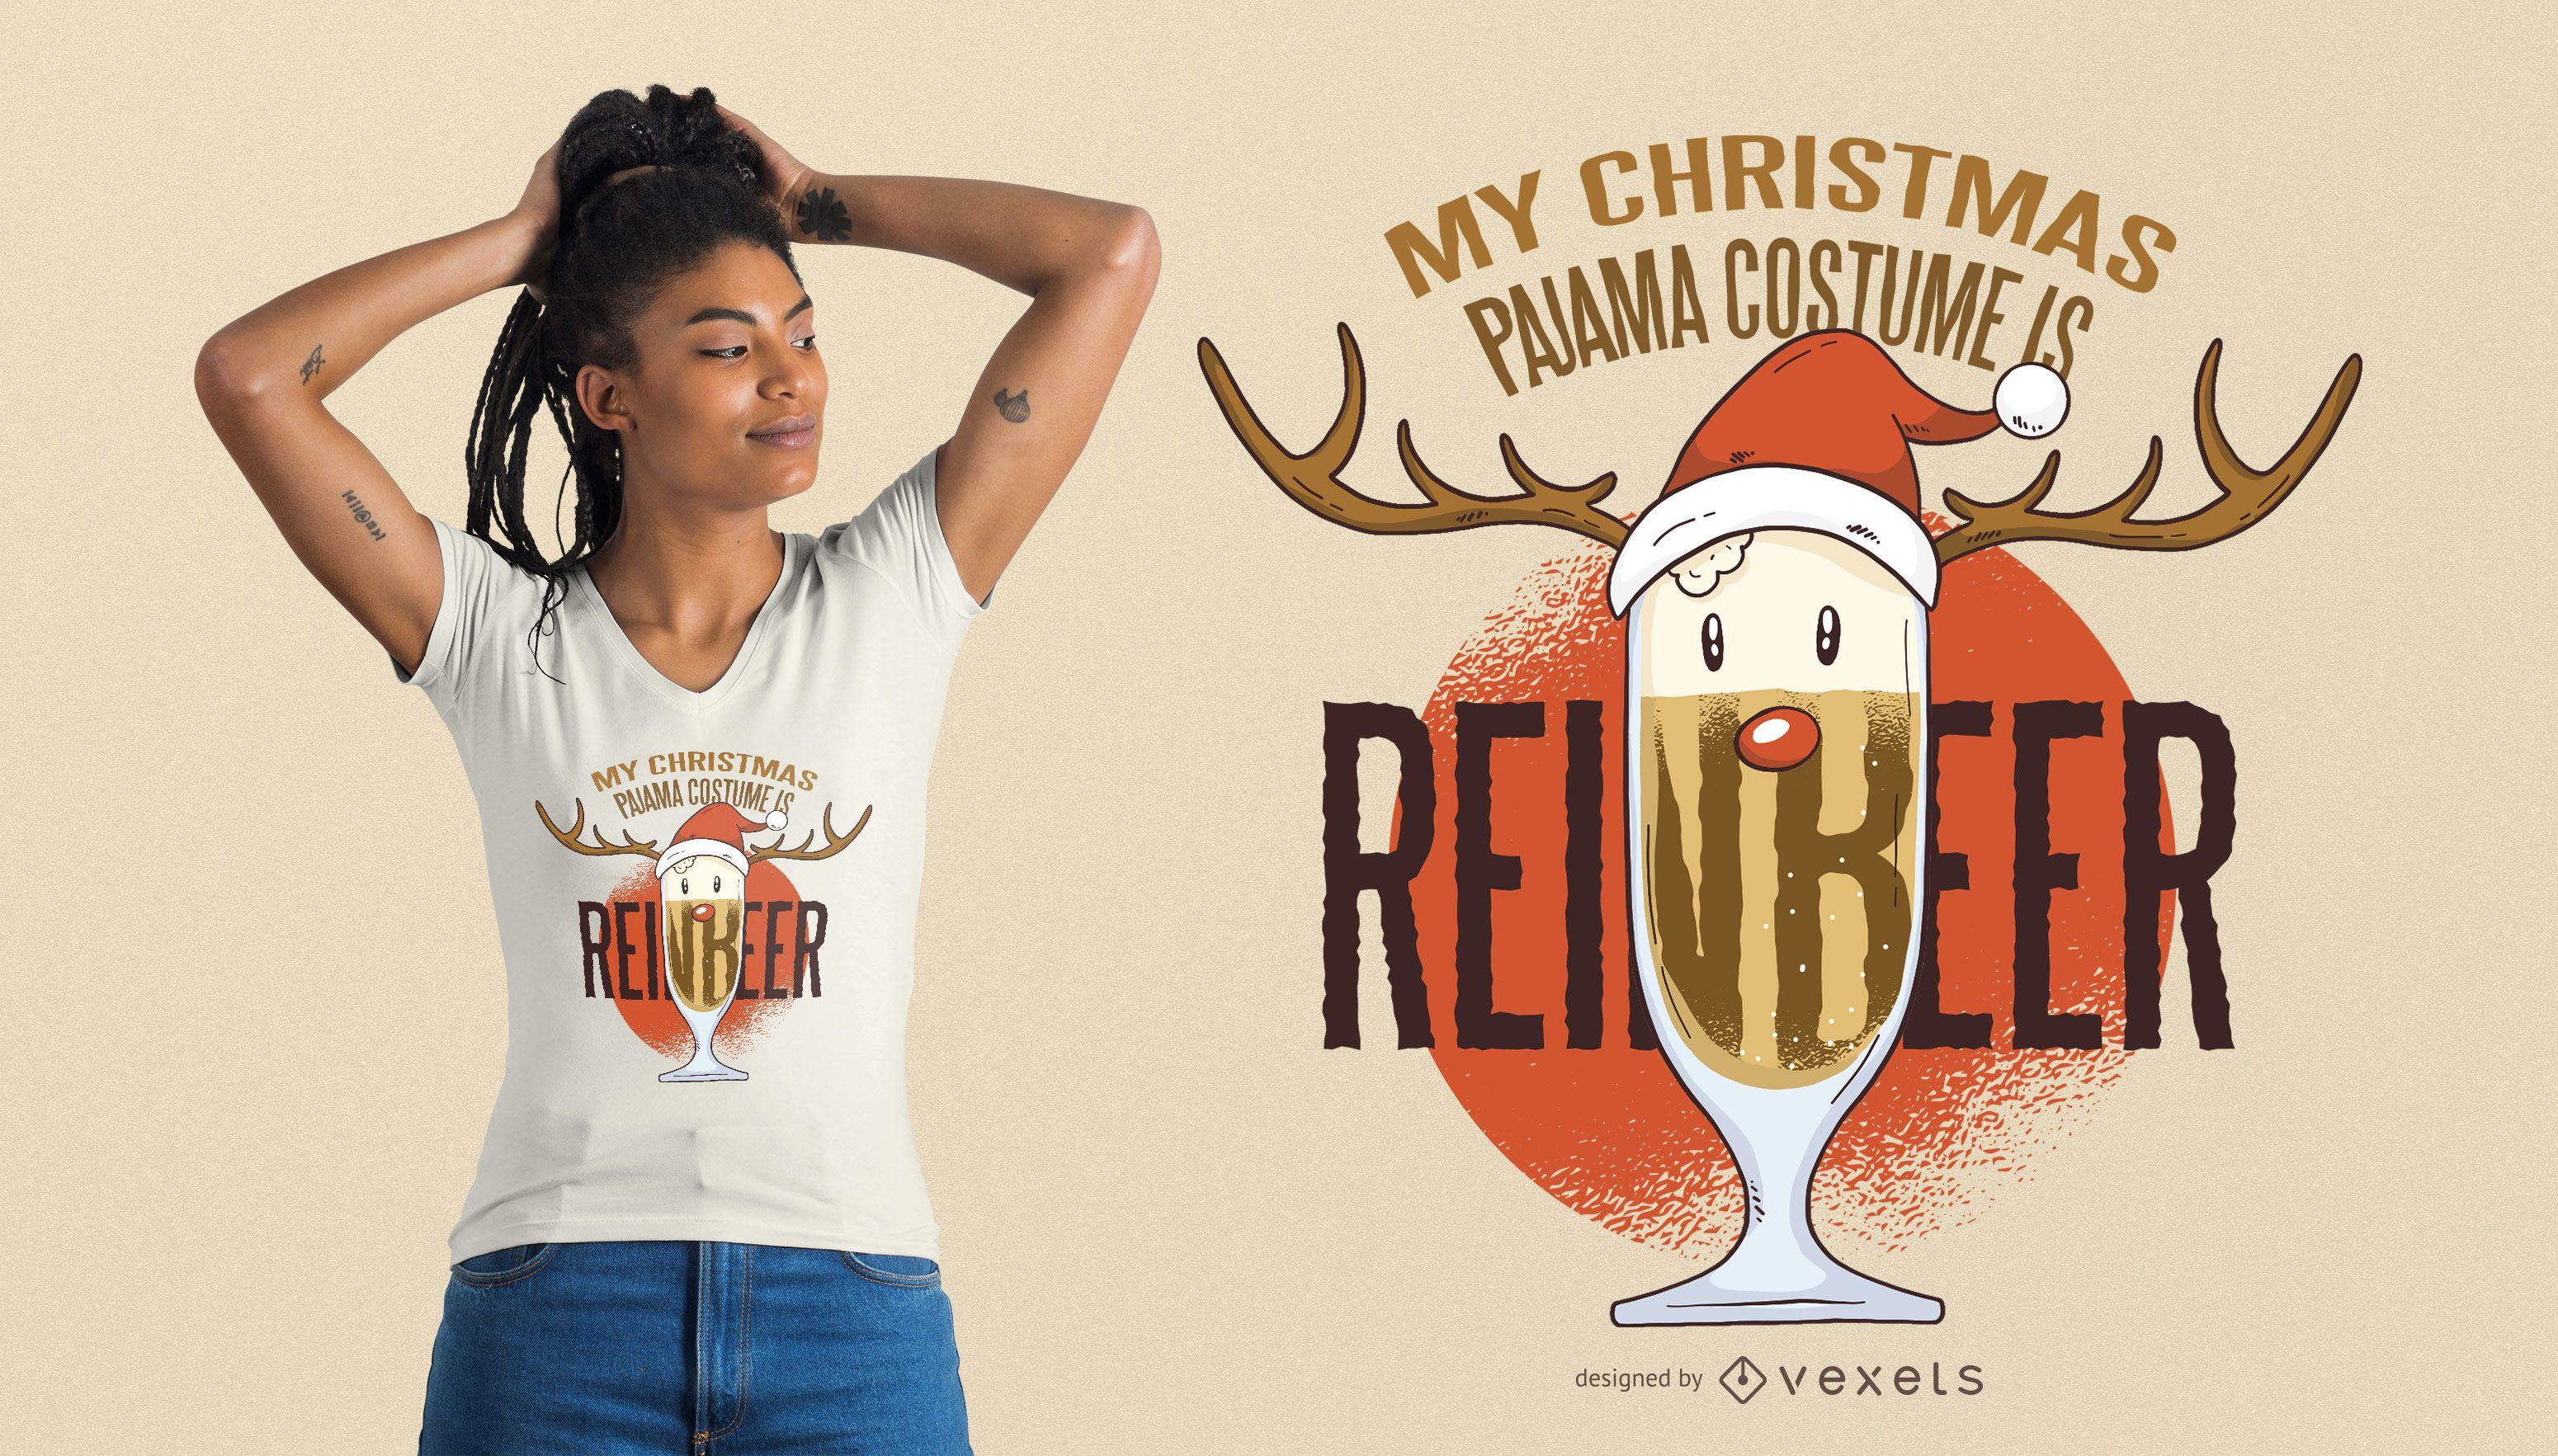 Reinbeer Christmas T-Shirt Design